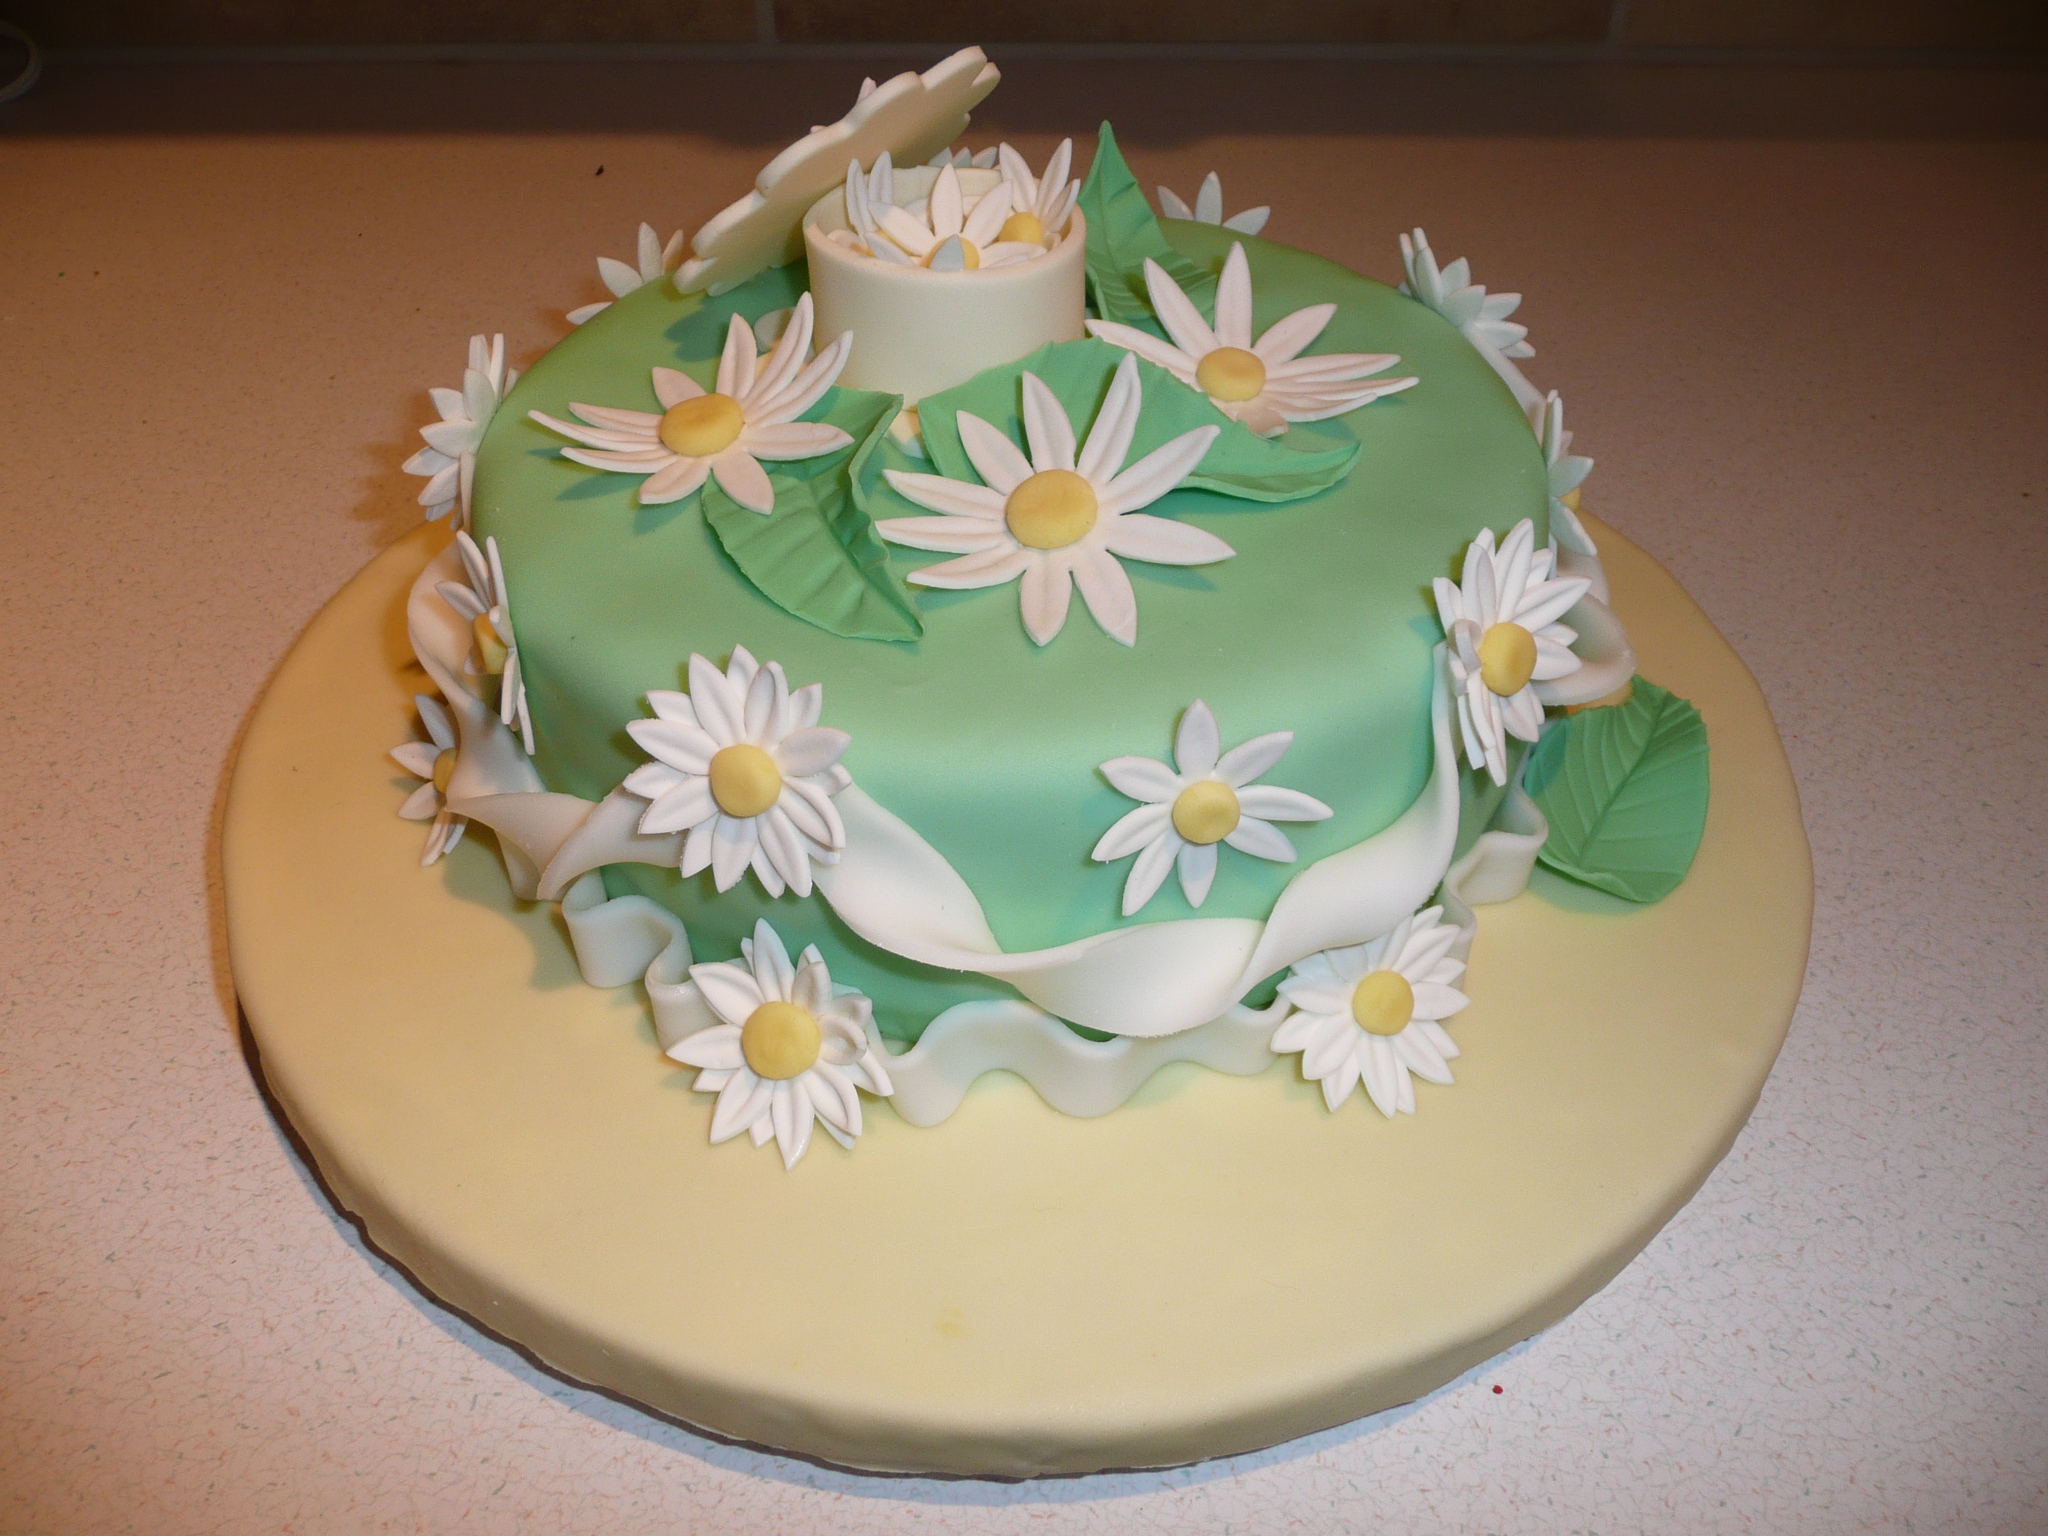 Cakes Flowers Daisies